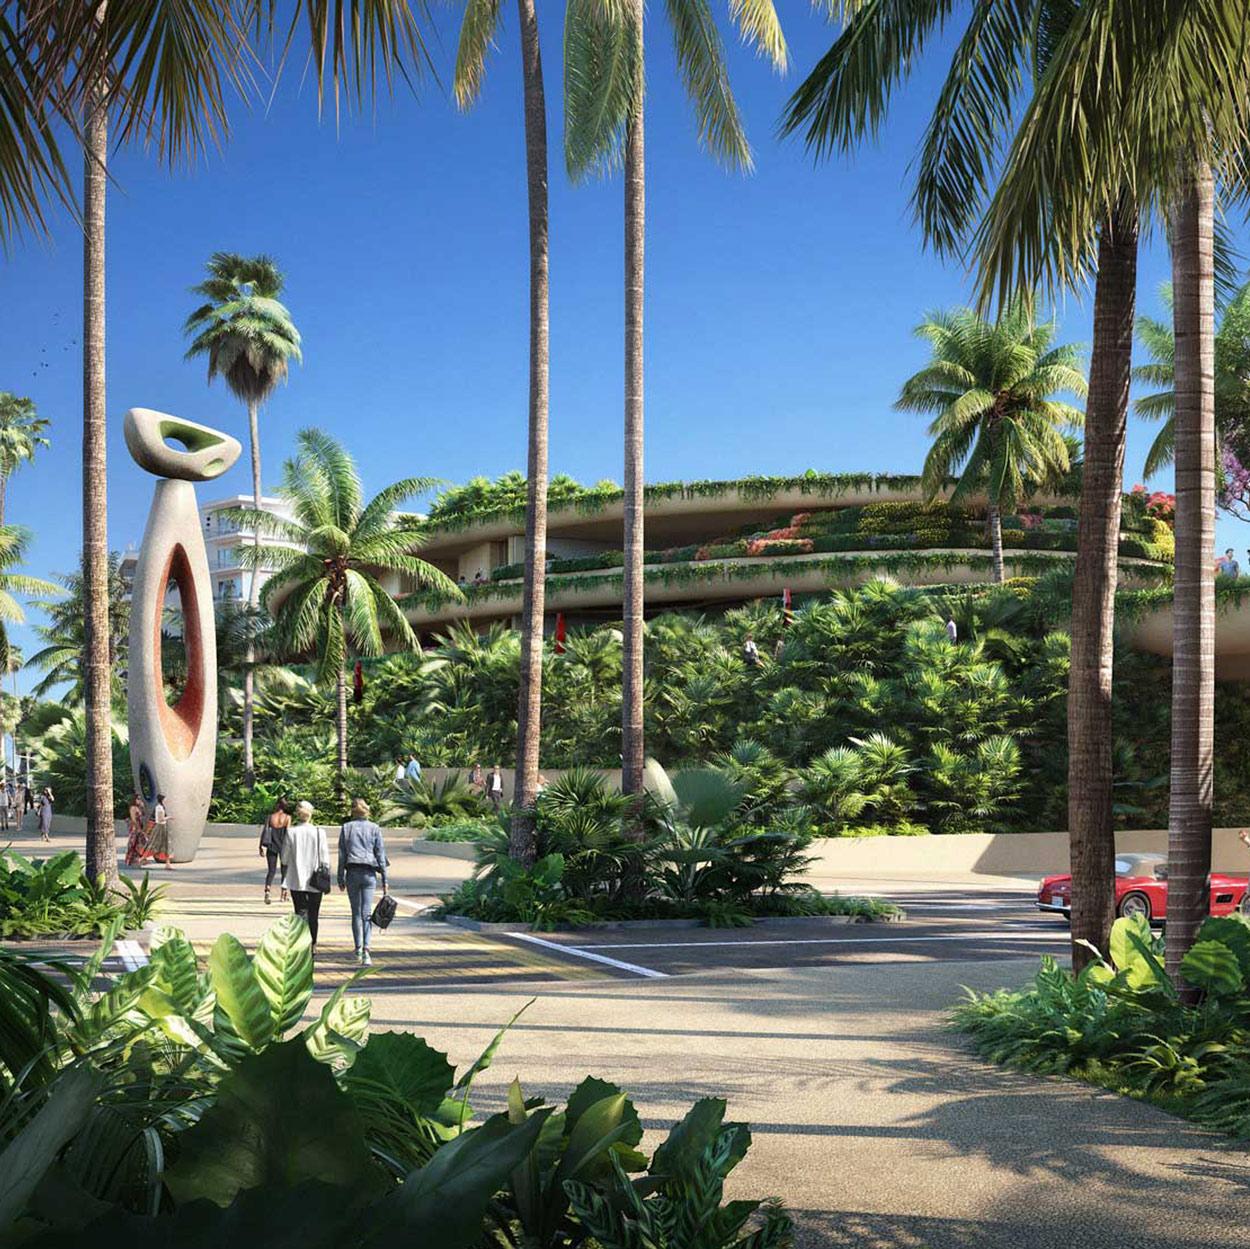 One Beverly Hills landscaped platform with modern sculpture